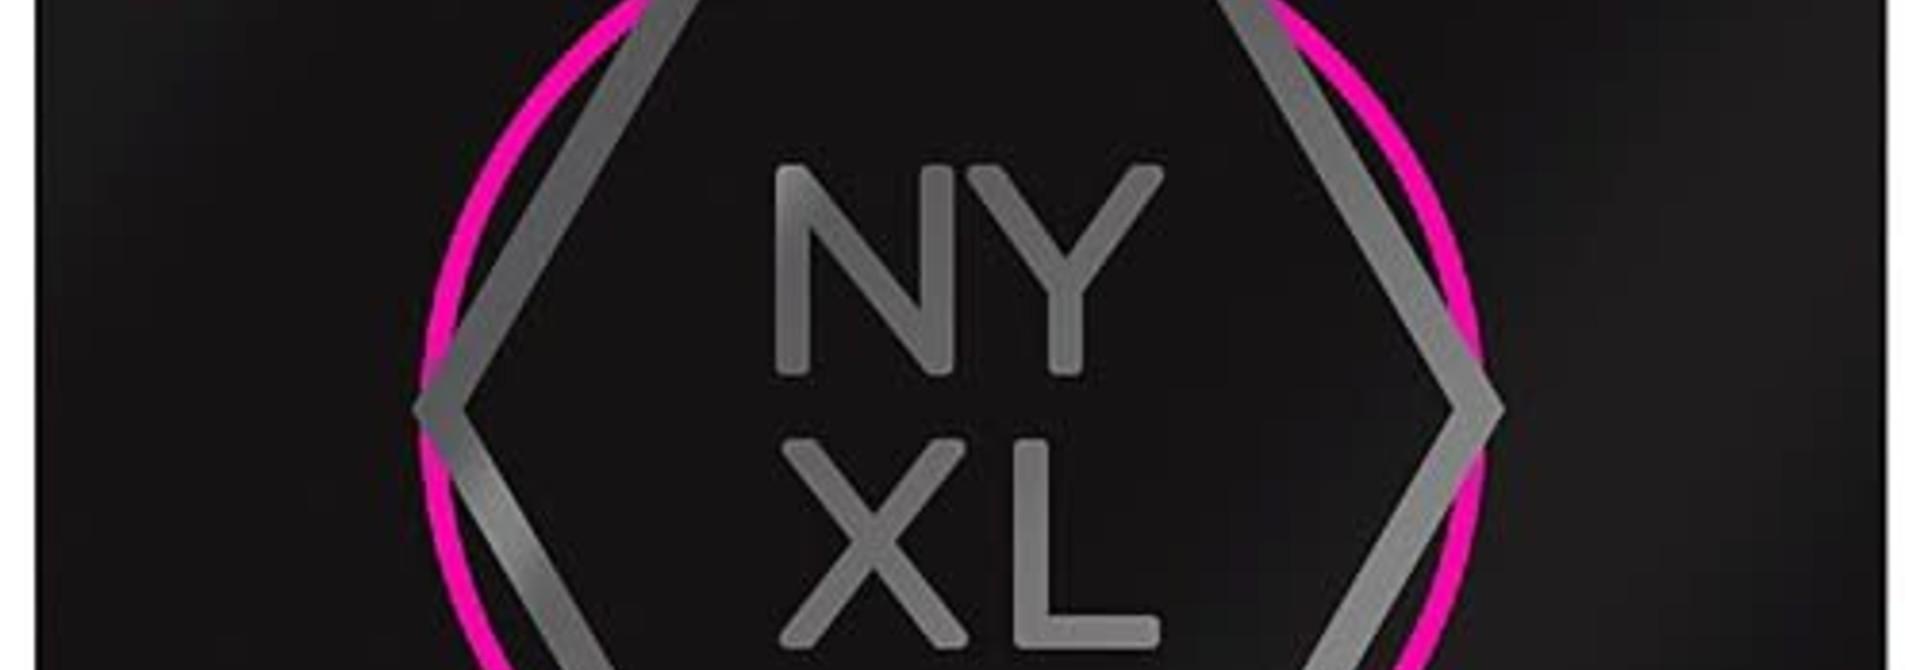 NYXL0942 Nickel Wound, Super Light, 09-42